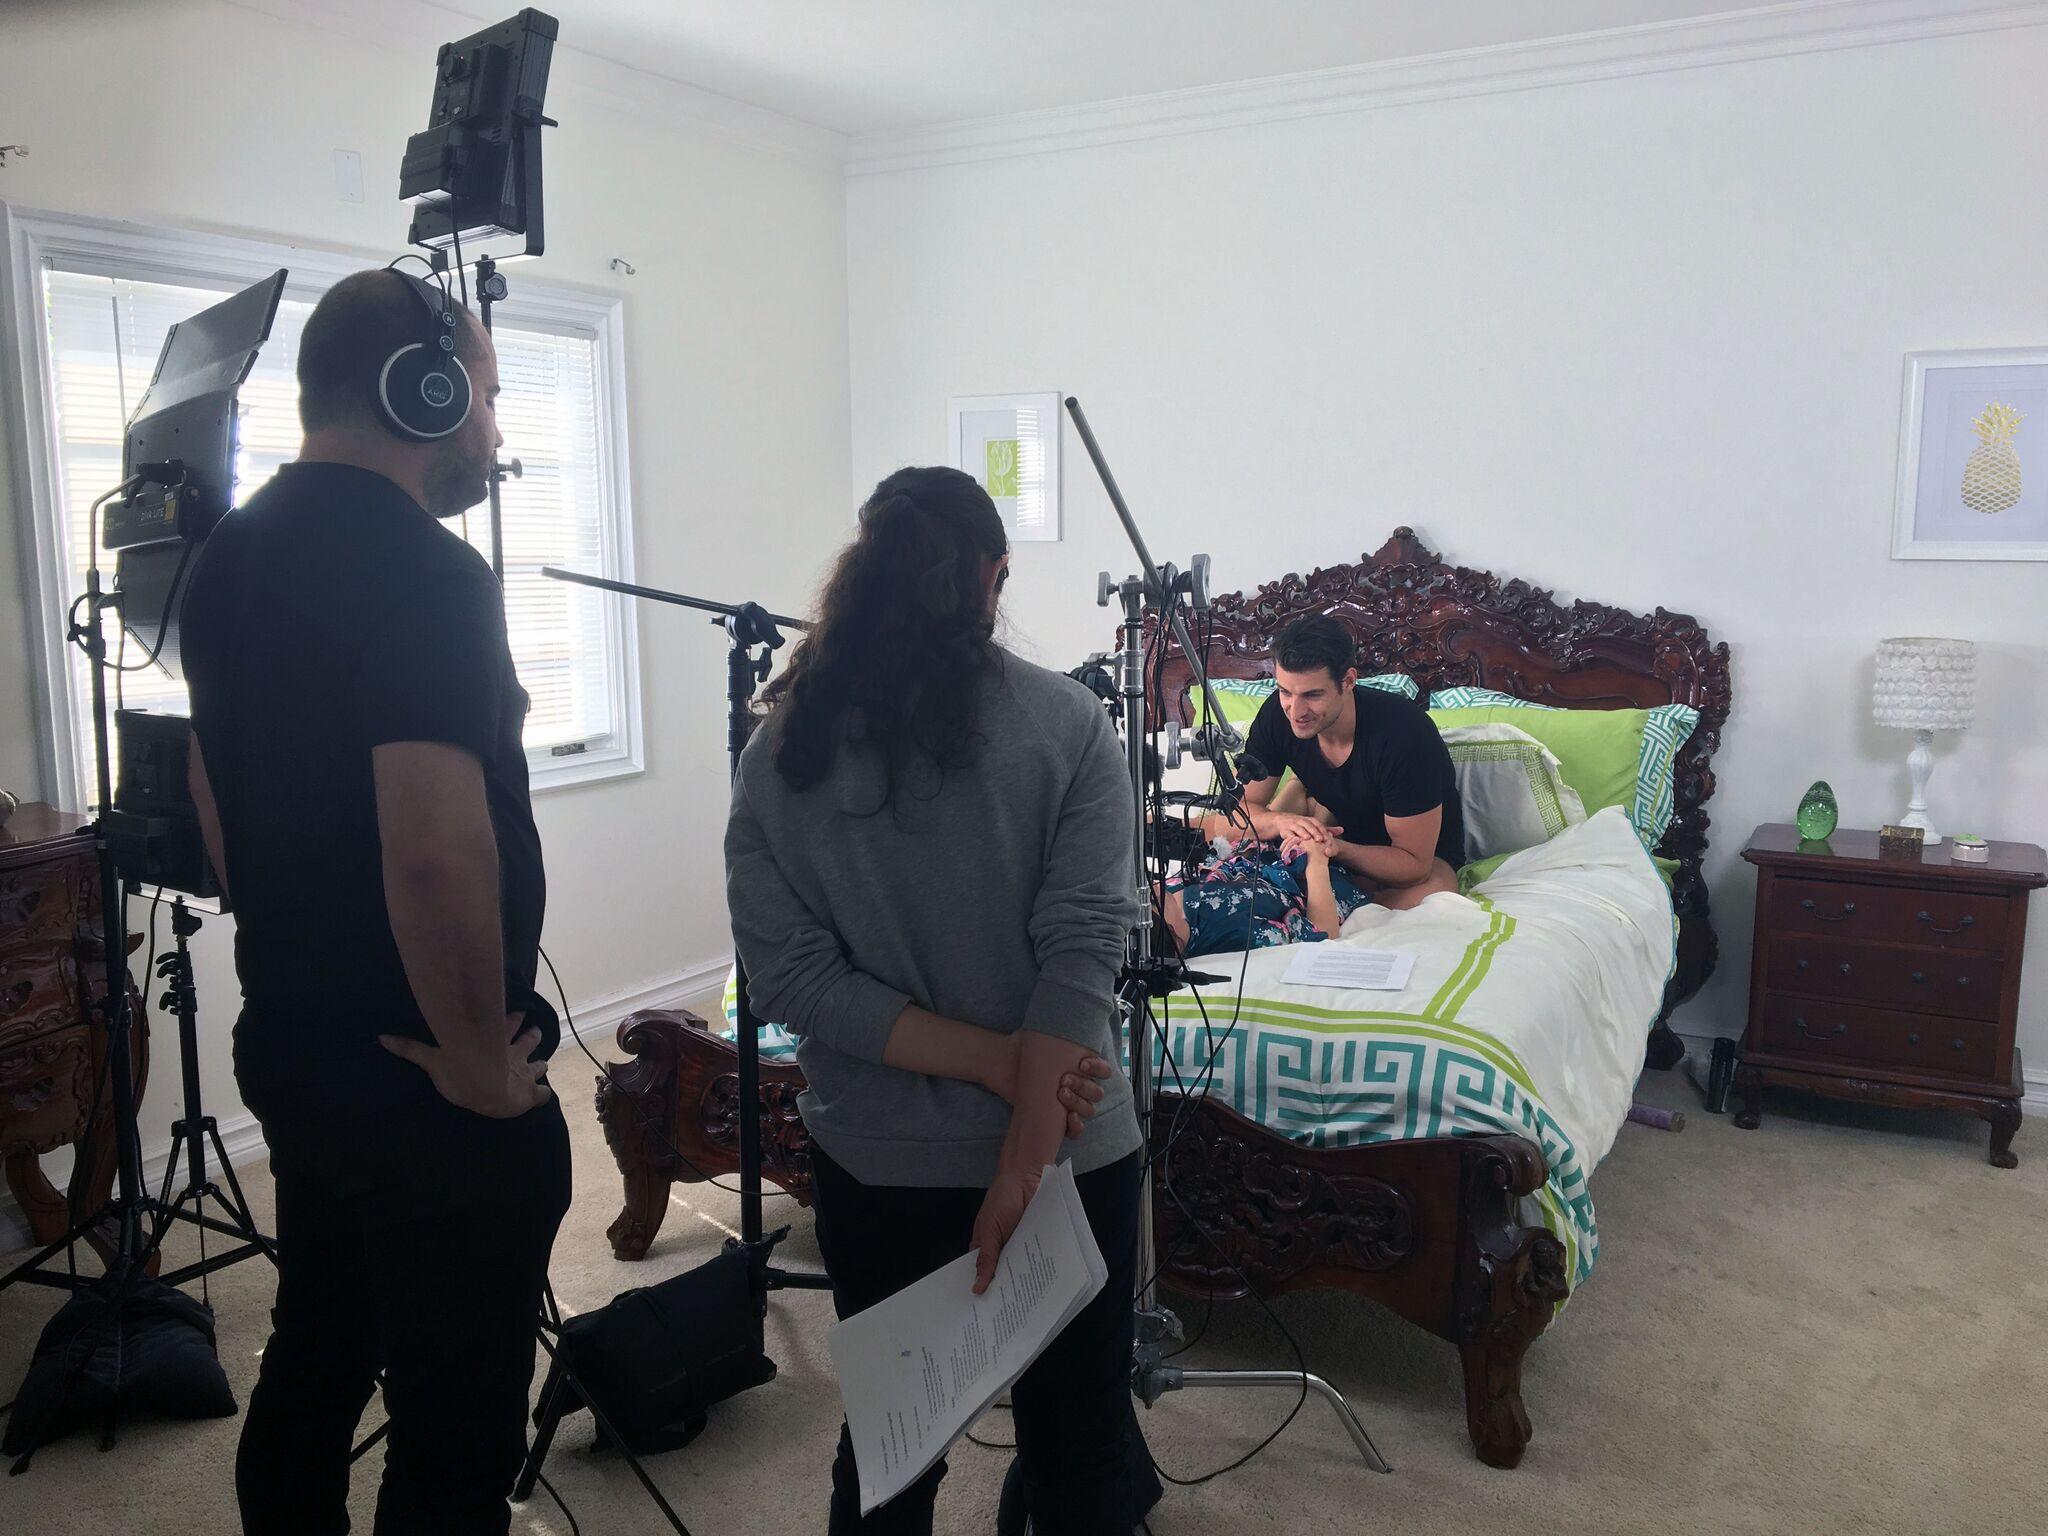 Virtuelle pornofilm